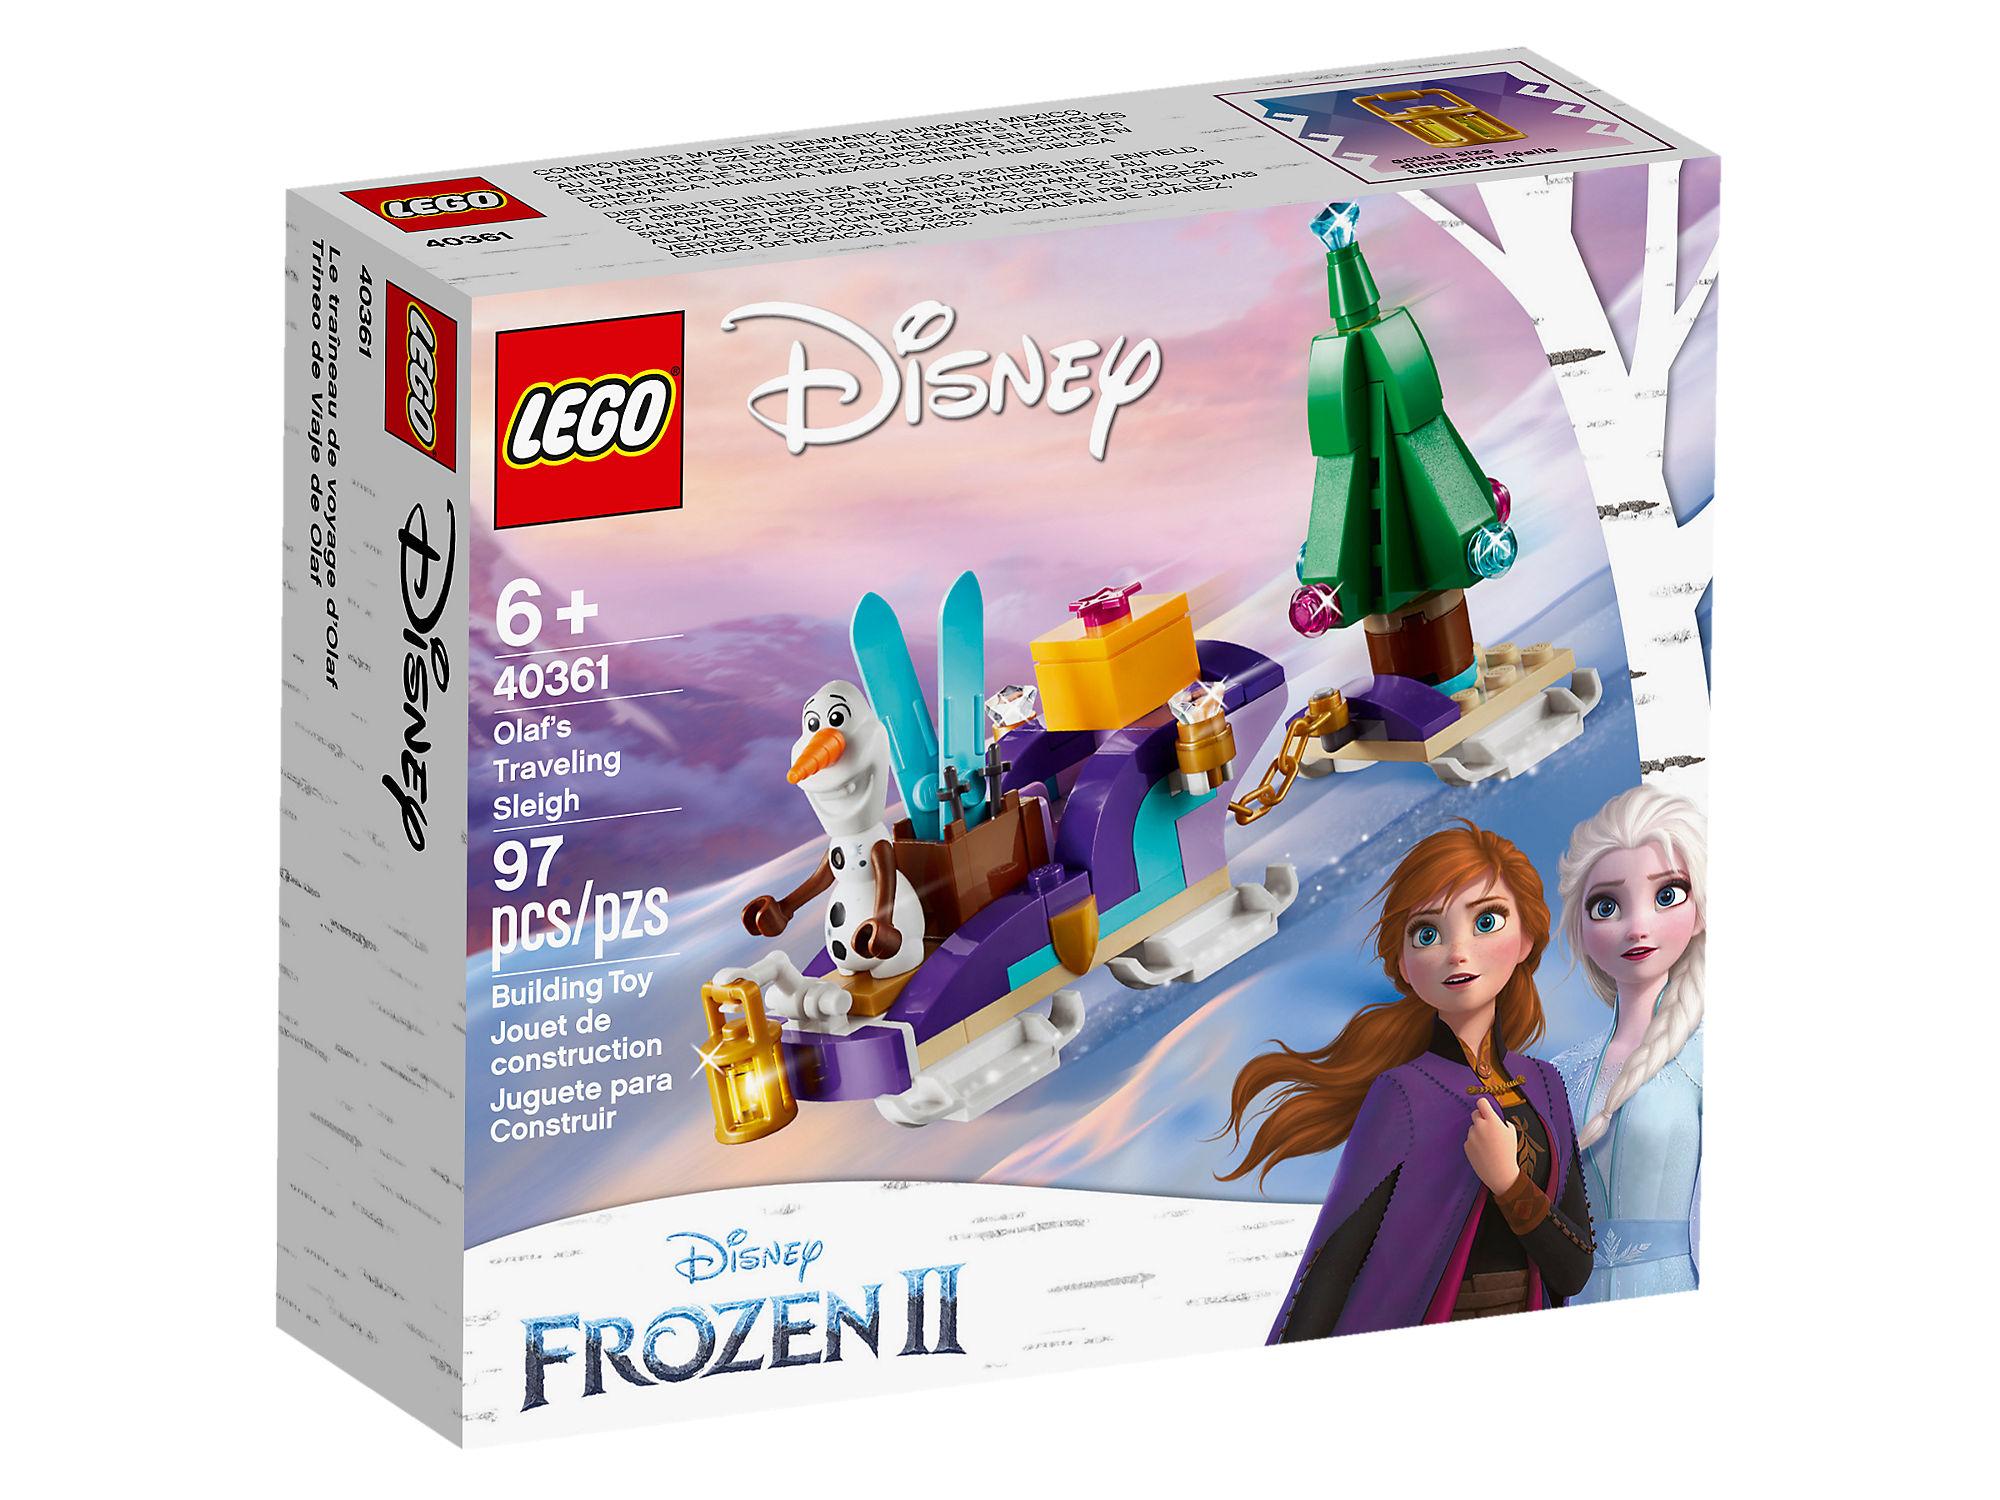 LEGO Disney Princess Frozen 2 Minifigure All New 2019 with Snowflakes Olaf